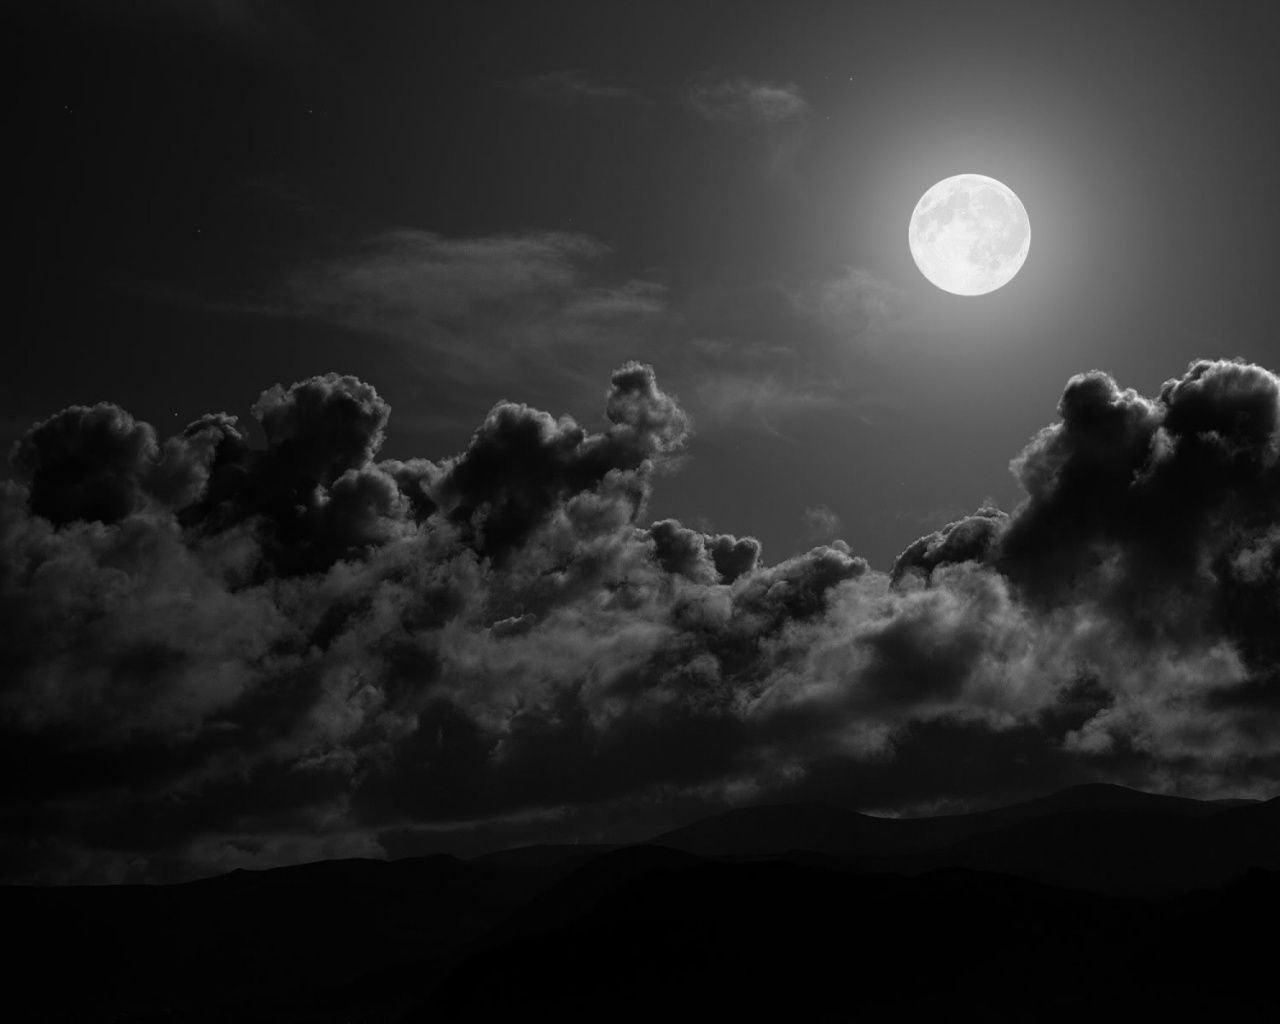 Dark Night Wallpapers Top Free Dark Night Backgrounds Wallpaperaccess